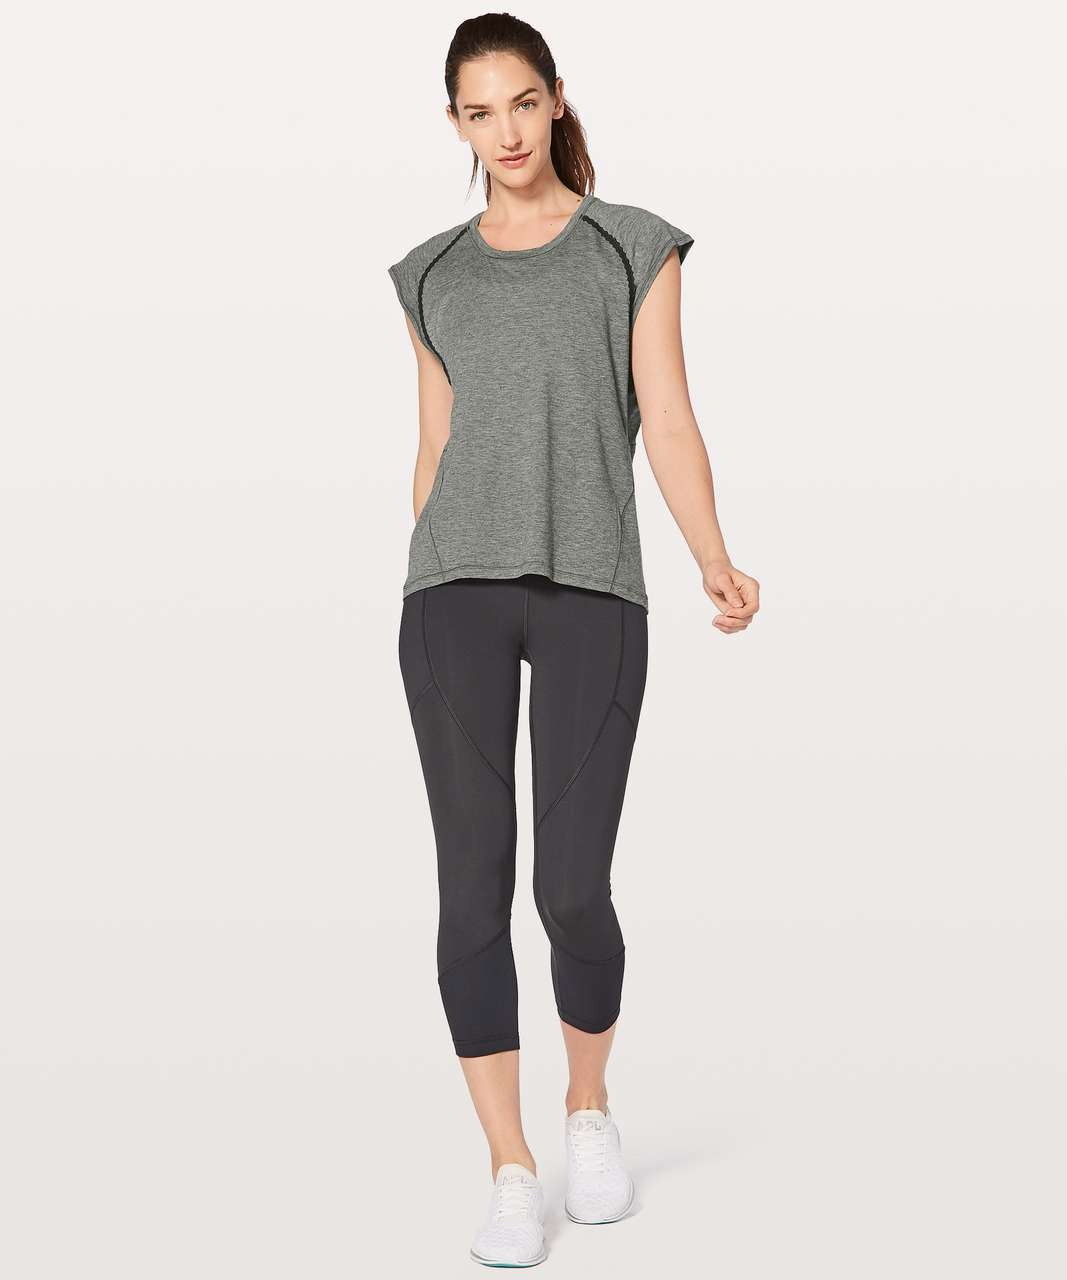 Lululemon Stop Drop & Squat Short Sleeve - Heathered Black